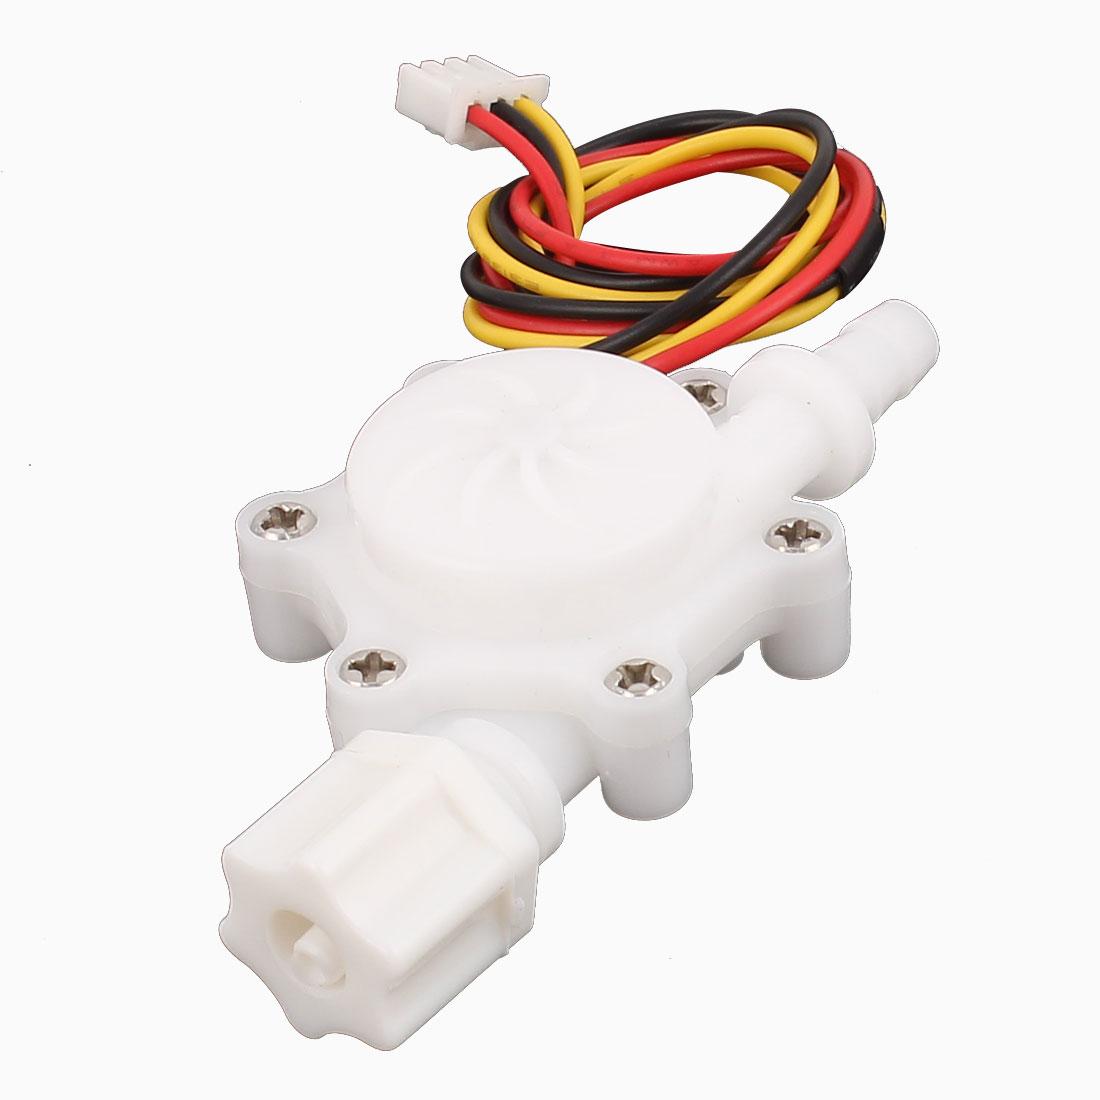 G1/4 Male Thread 6mm Outlet Outer Dia Water Flow Sensor 0.2-2.5L/min SEN-HZ06FB